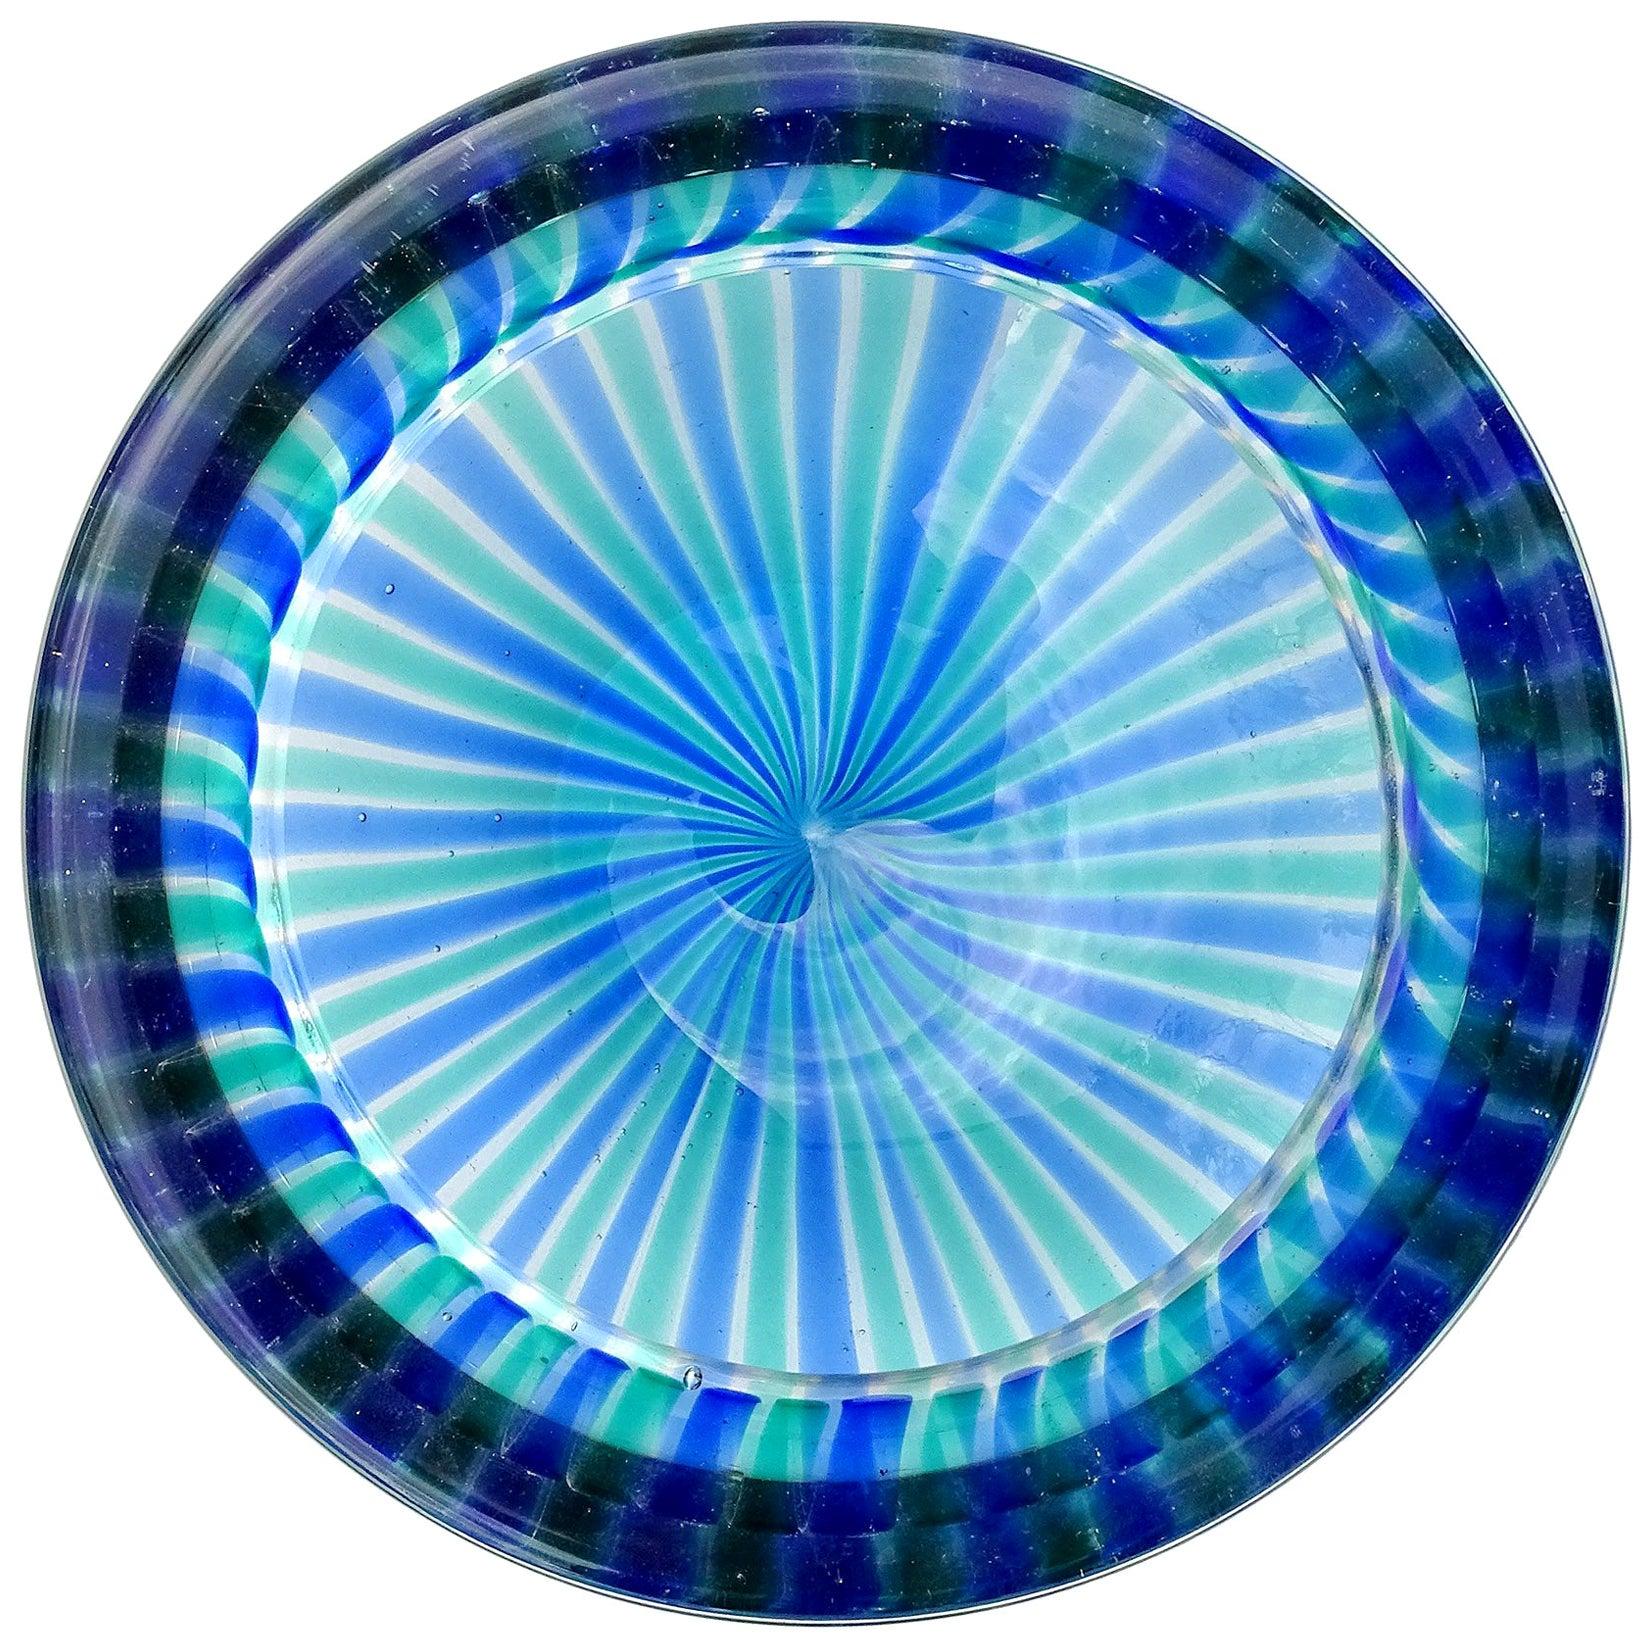 Fratelli Toso Murano Blue Green Ribbons Italian Art Glass Decorative Dish Bowl